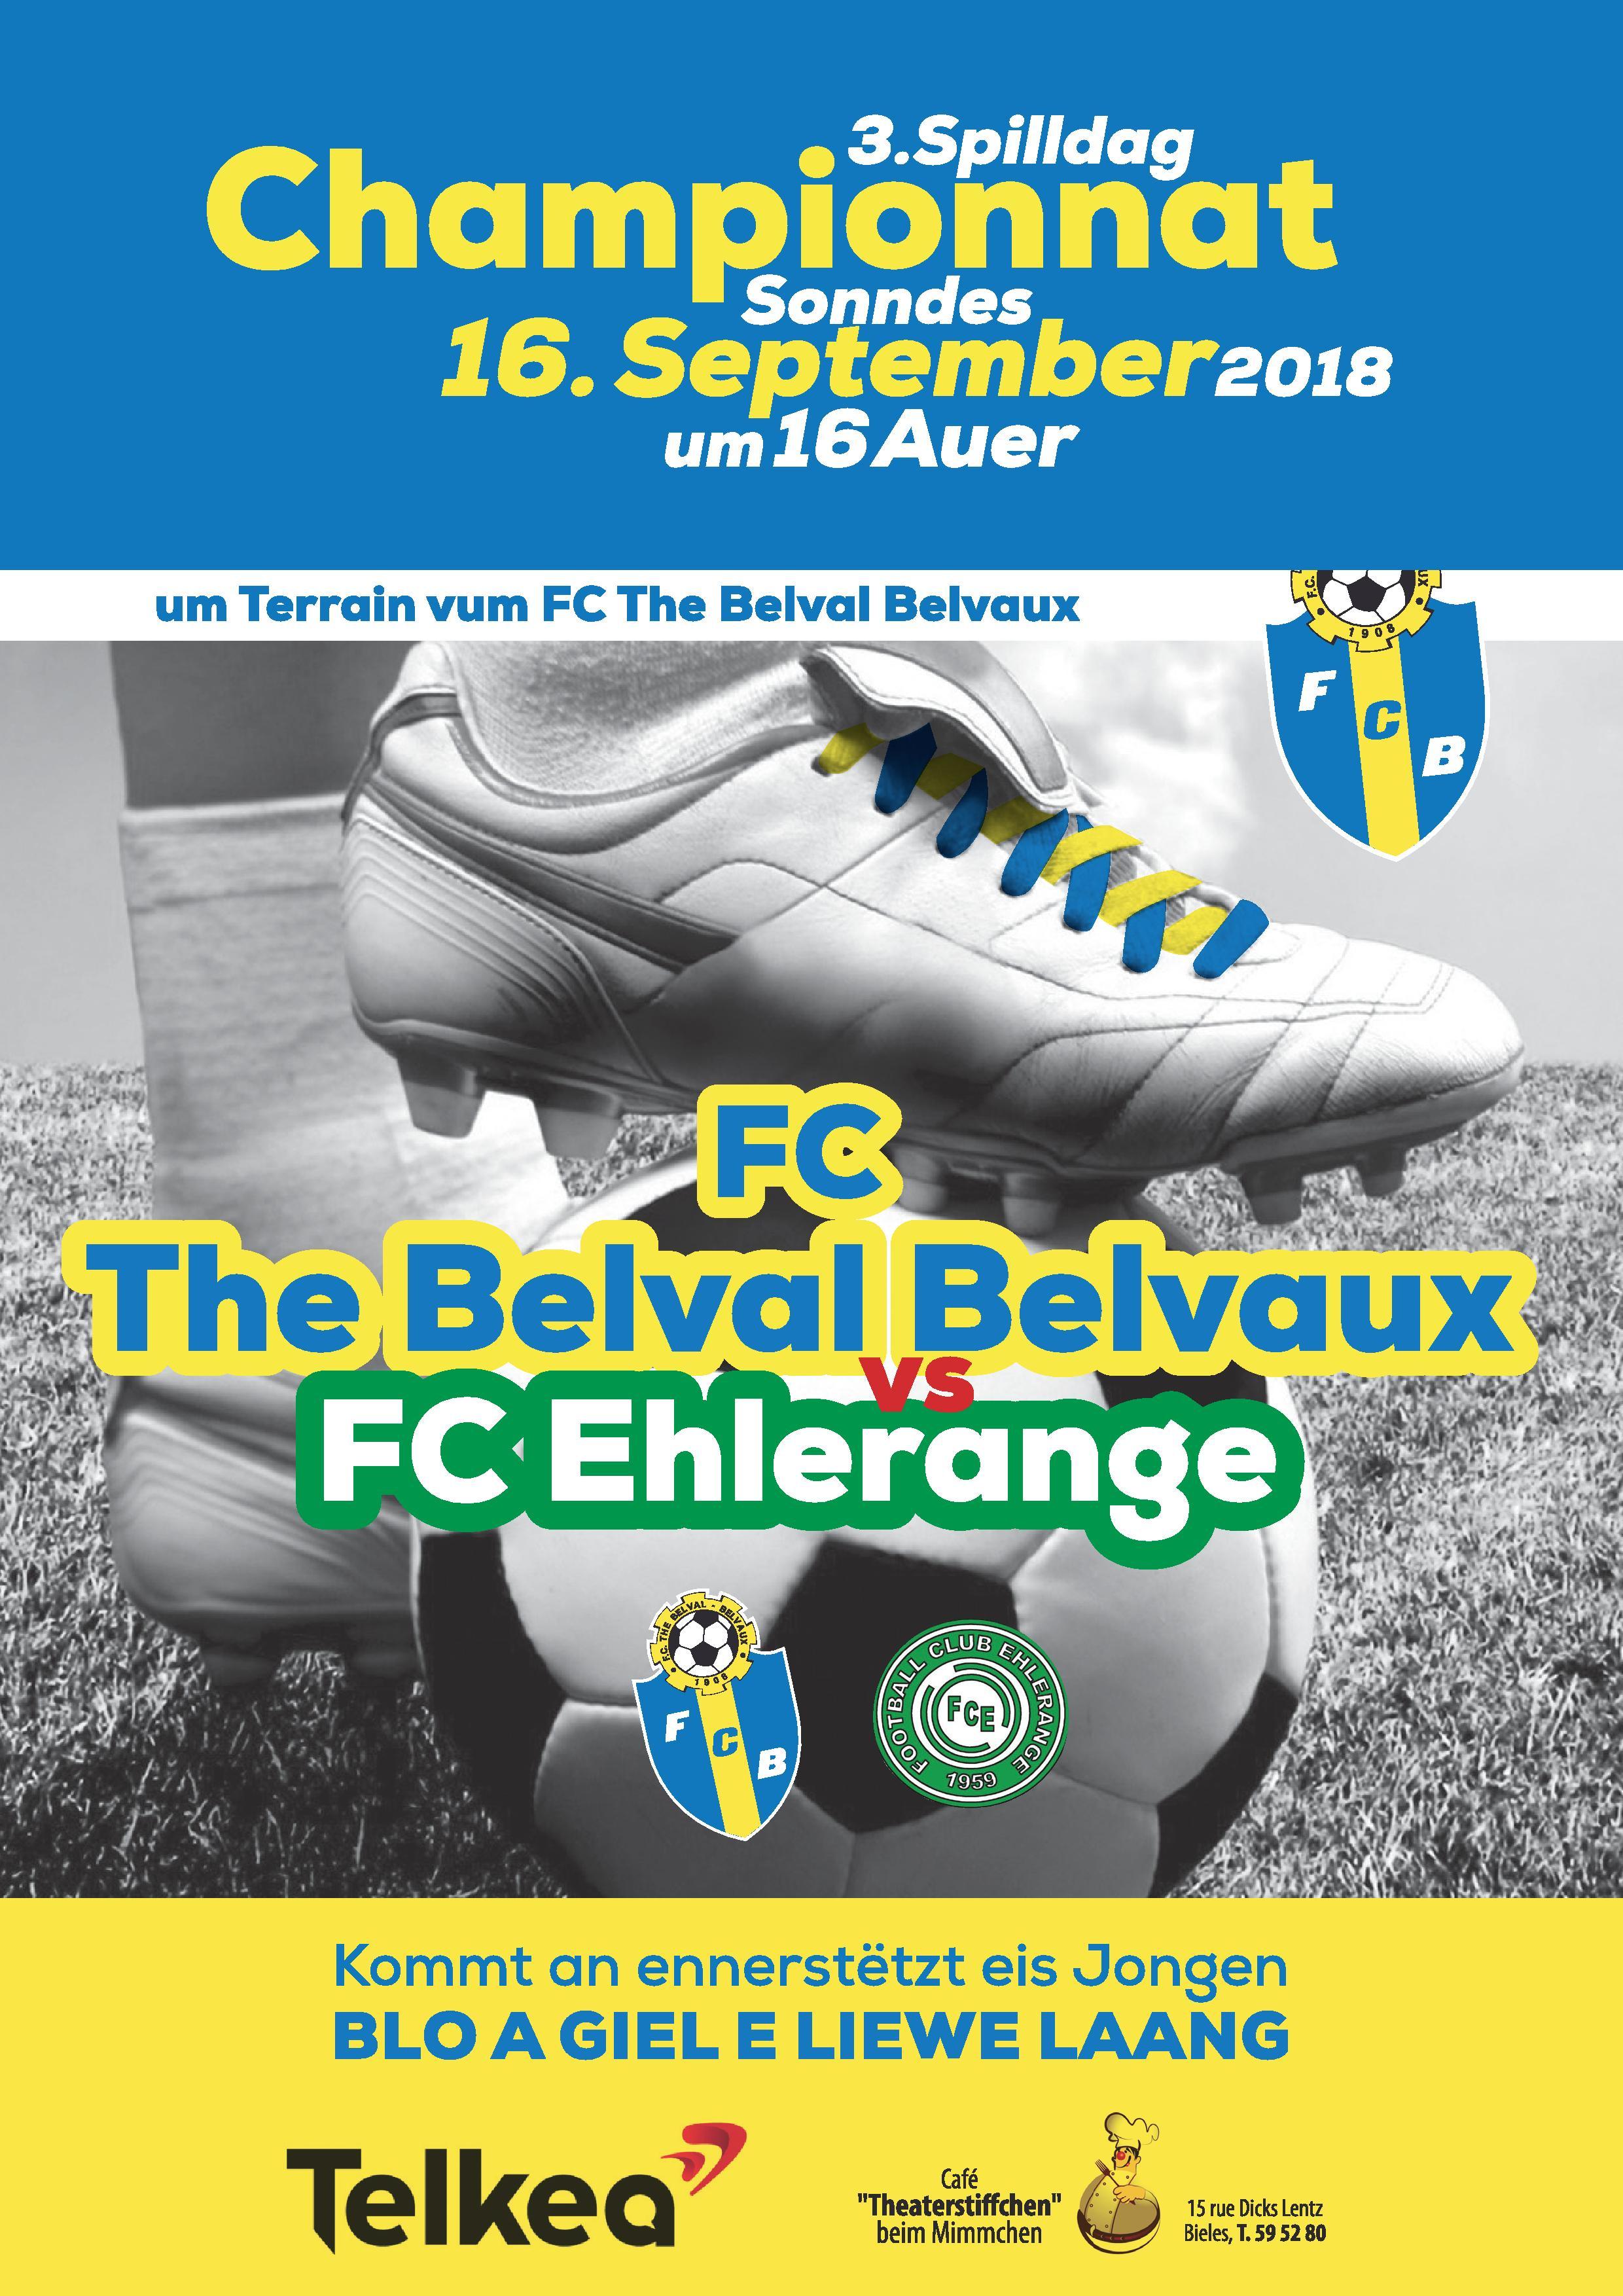 FC The Belval Belvaux vs FC Ehlerange (16.09.18 16h00)